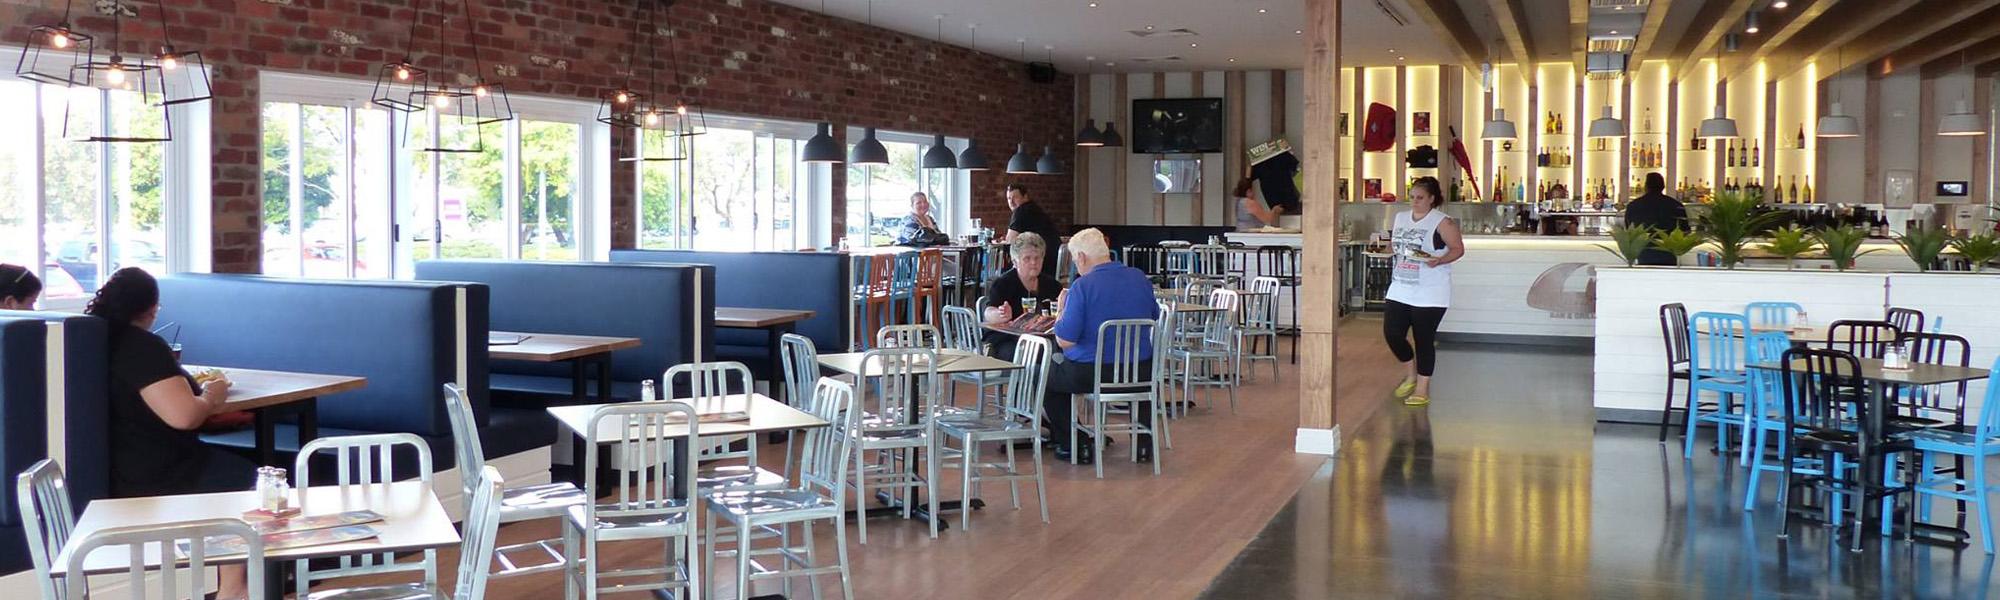 Beach House Bar U0026 Grill   Browns Plains U003e Home | Beach House Bar U0026 Grill Is  An Australian Themed Bar U0026 Grill Celebrating Australian Beach Culture And  ...